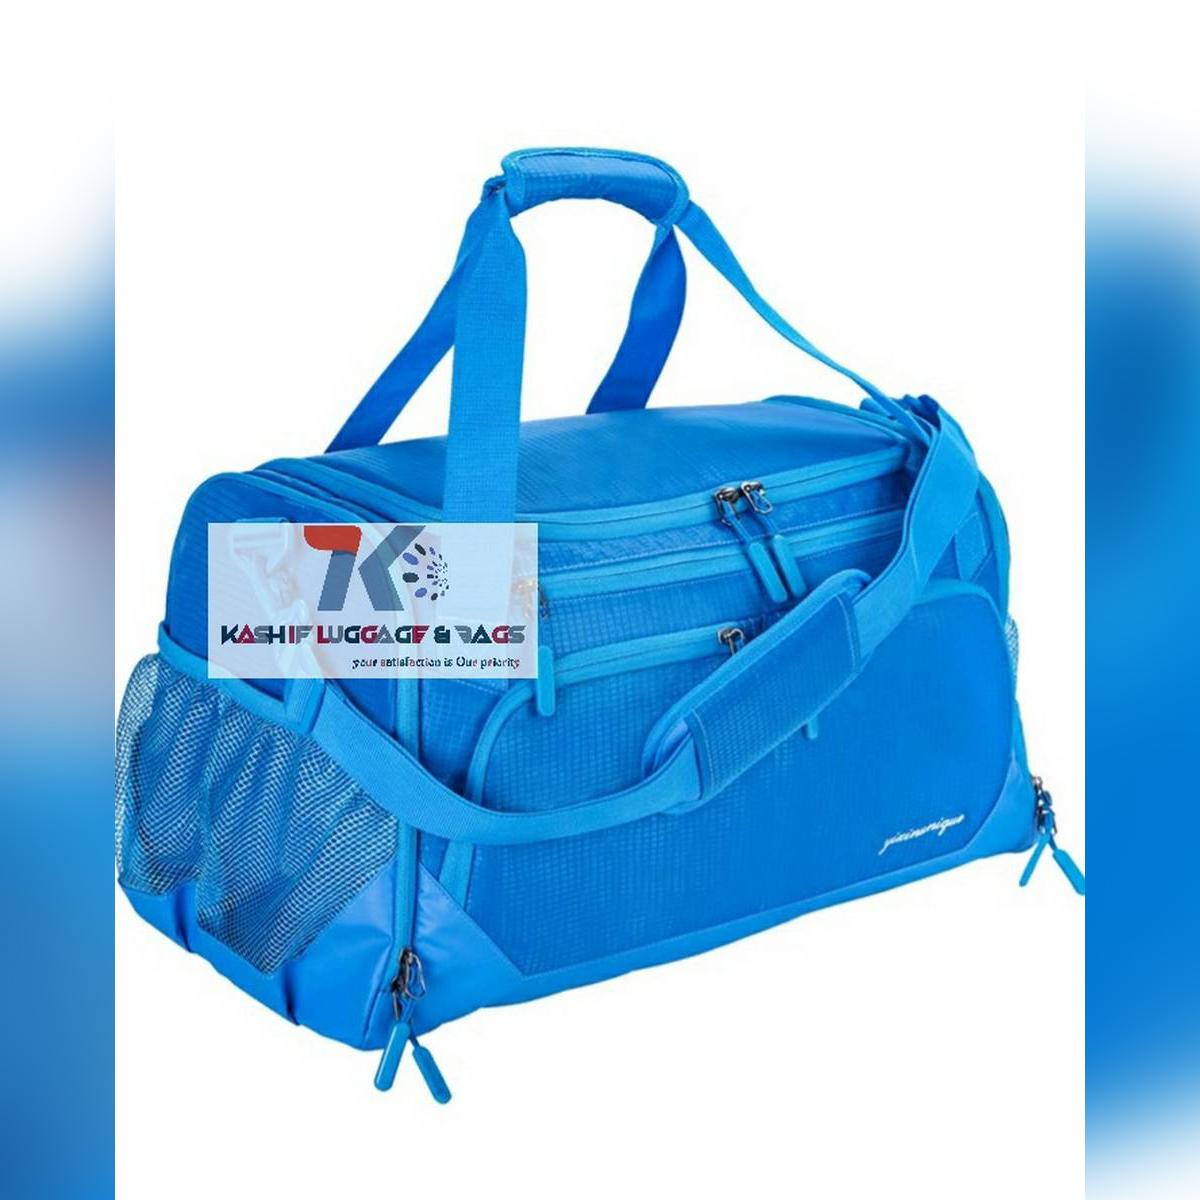 "Gym Bag, Sports Travel Duffel Bag with Shoes Compartment & Wet Pocket & Water Resistance Pouch, Men Women, 31L (20""),"